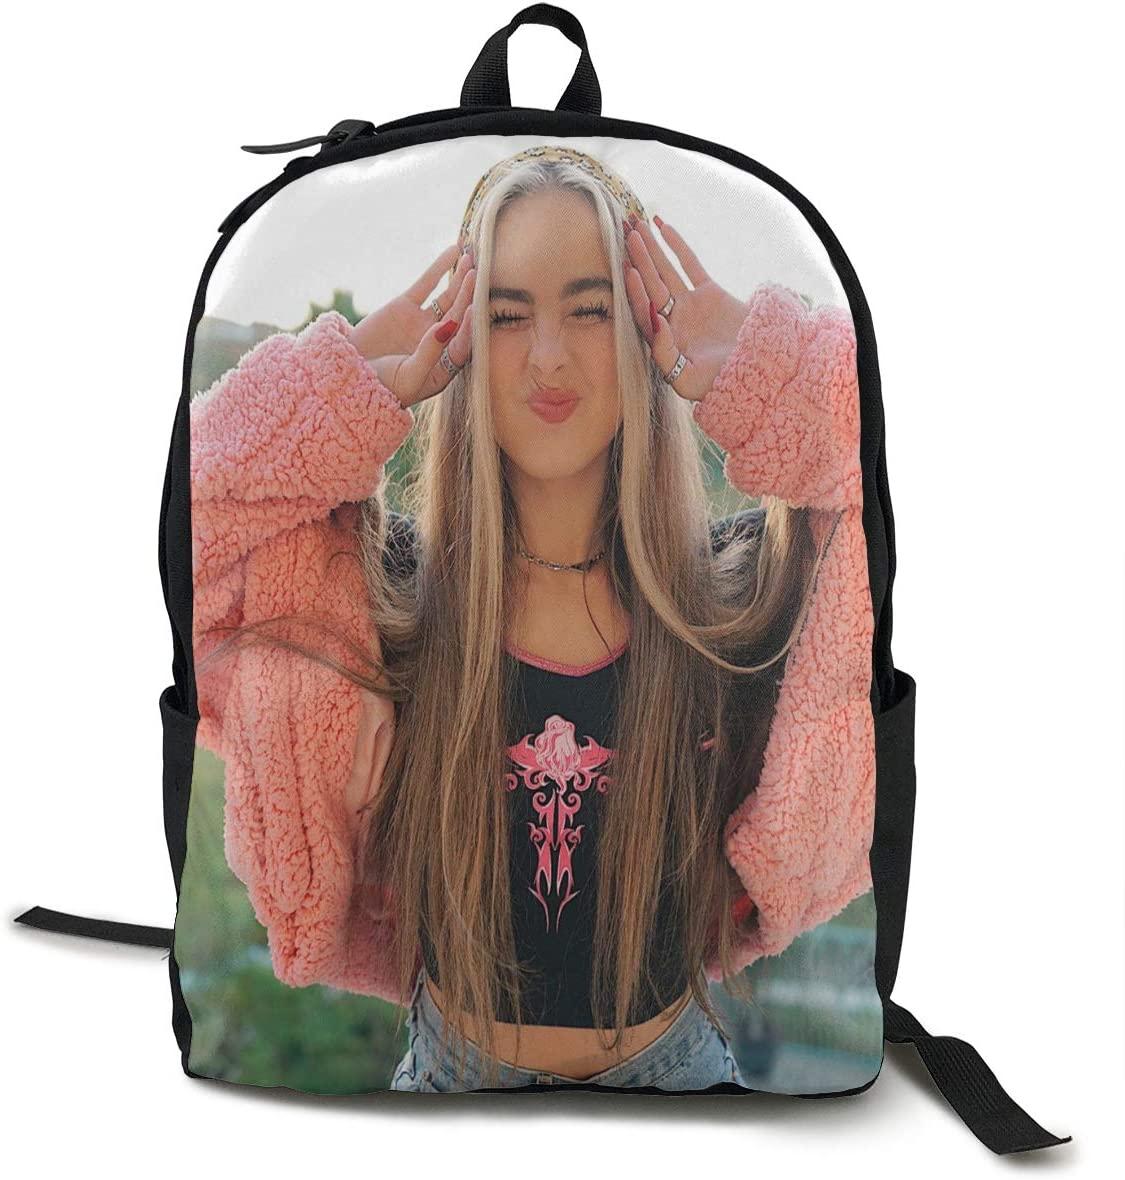 Addison Rae Lightweight Multi-Function College School Laptop Backpack